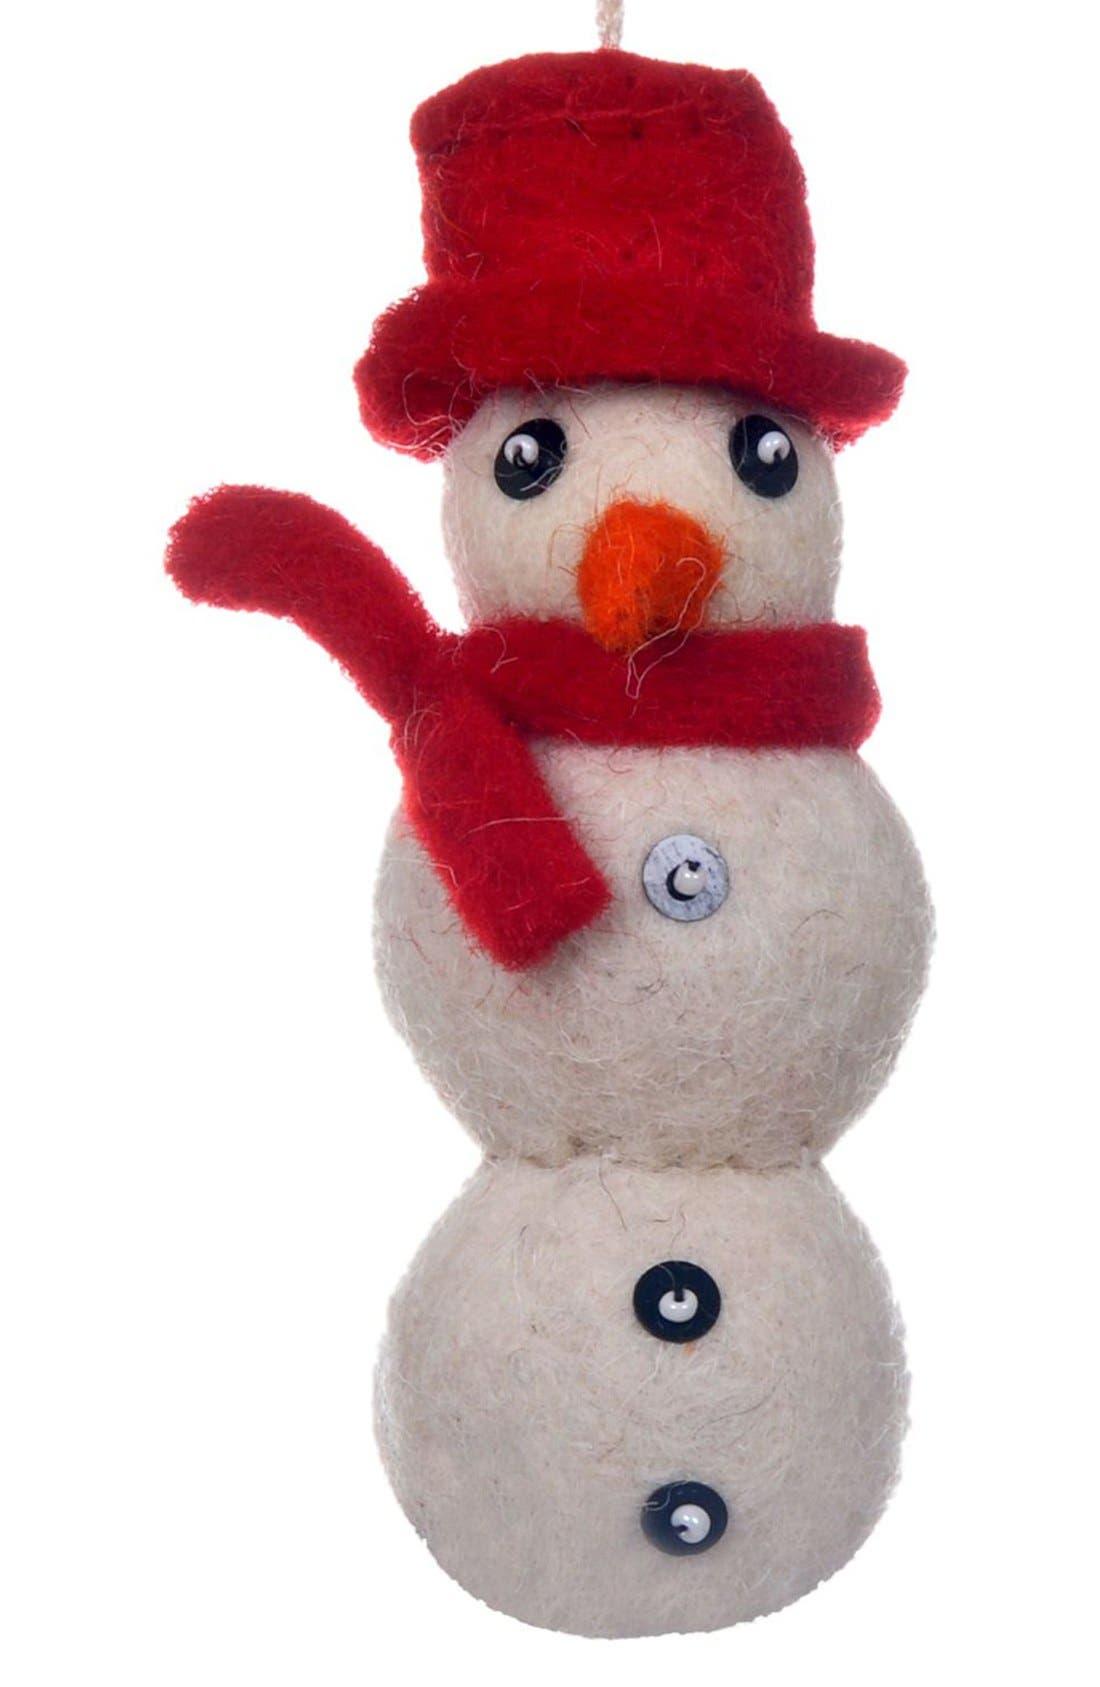 Alternate Image 1 Selected - Creative Co-Op Felt Snowman Ornament